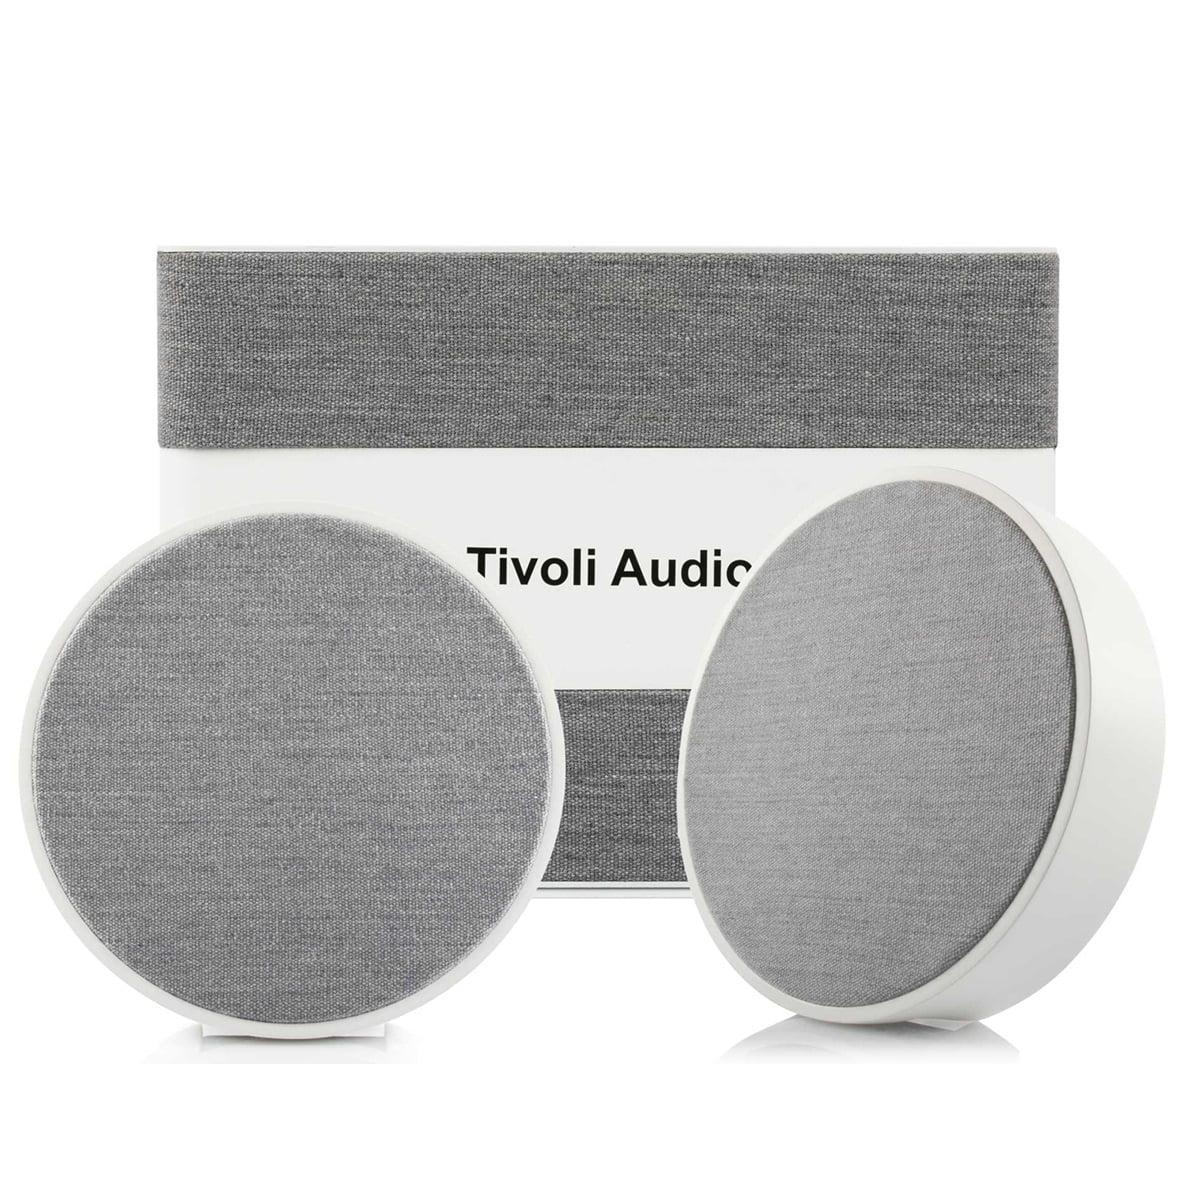 Tivoli Audio SPHERA Wireless Speakers (Pair) with ART Model Sub Wi-Fi Subwoofer by Tivoli Audio